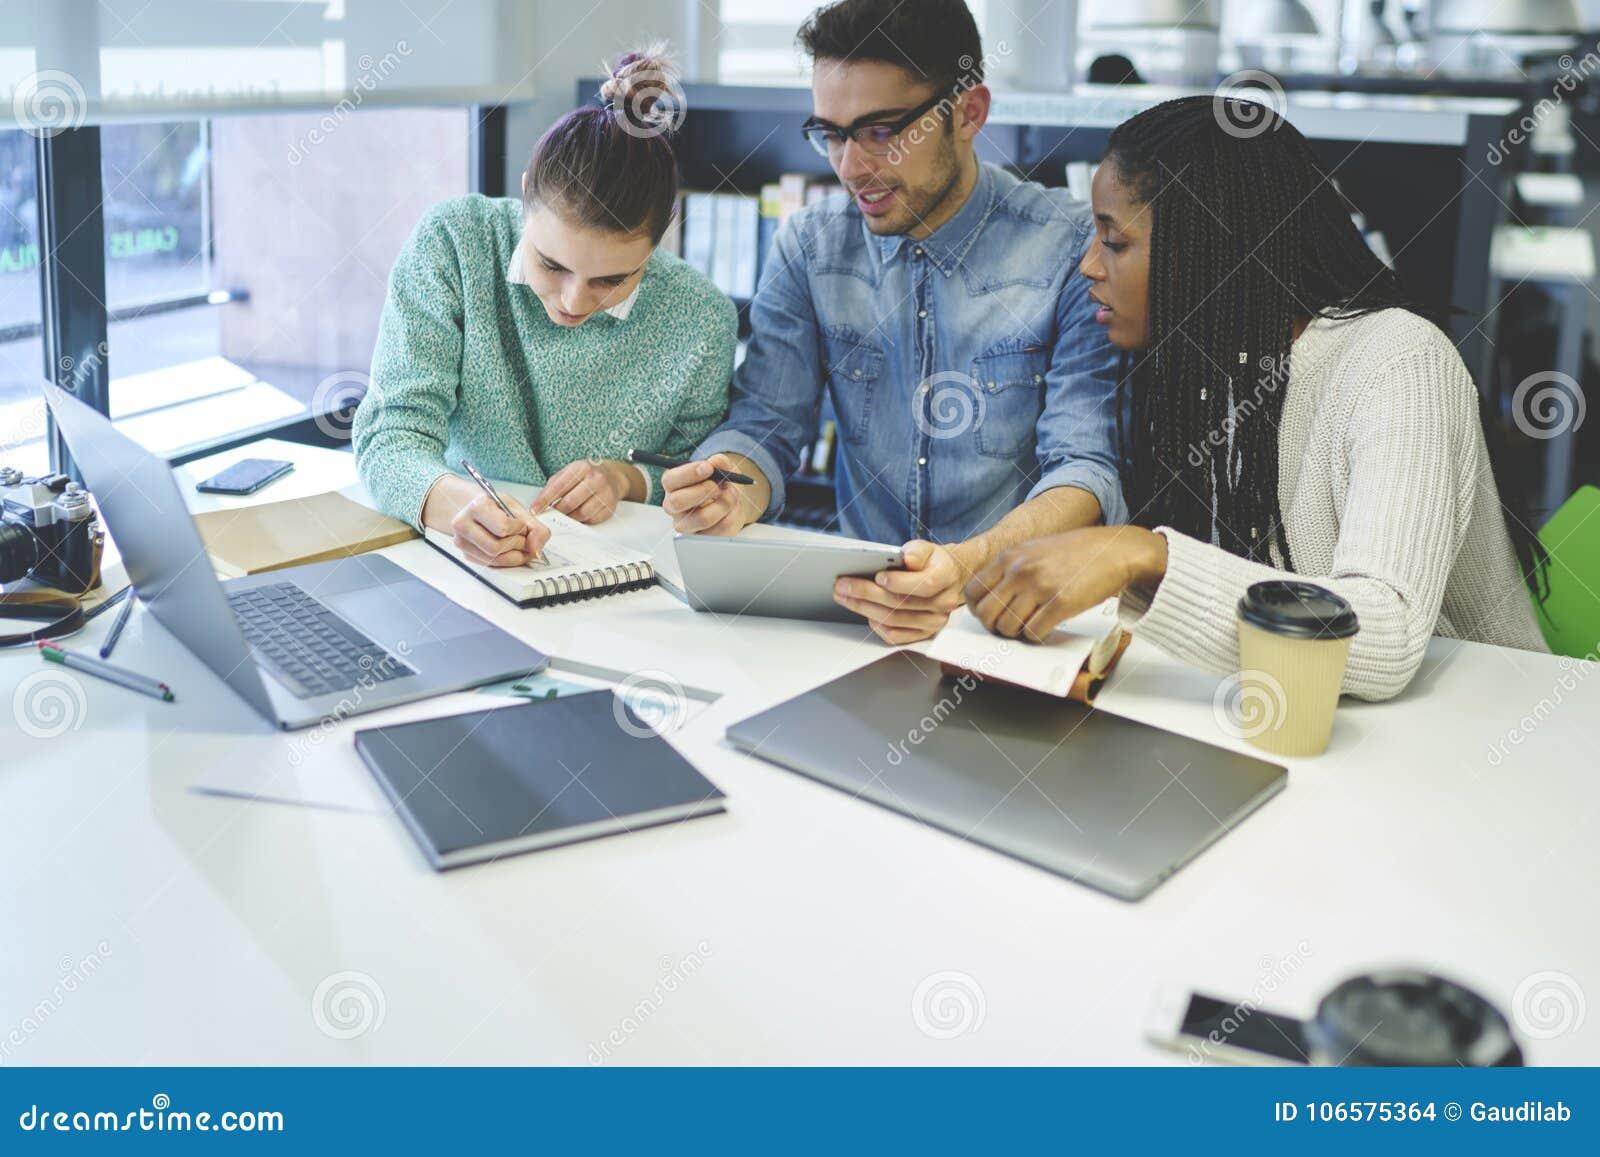 Custom paper writers service uk